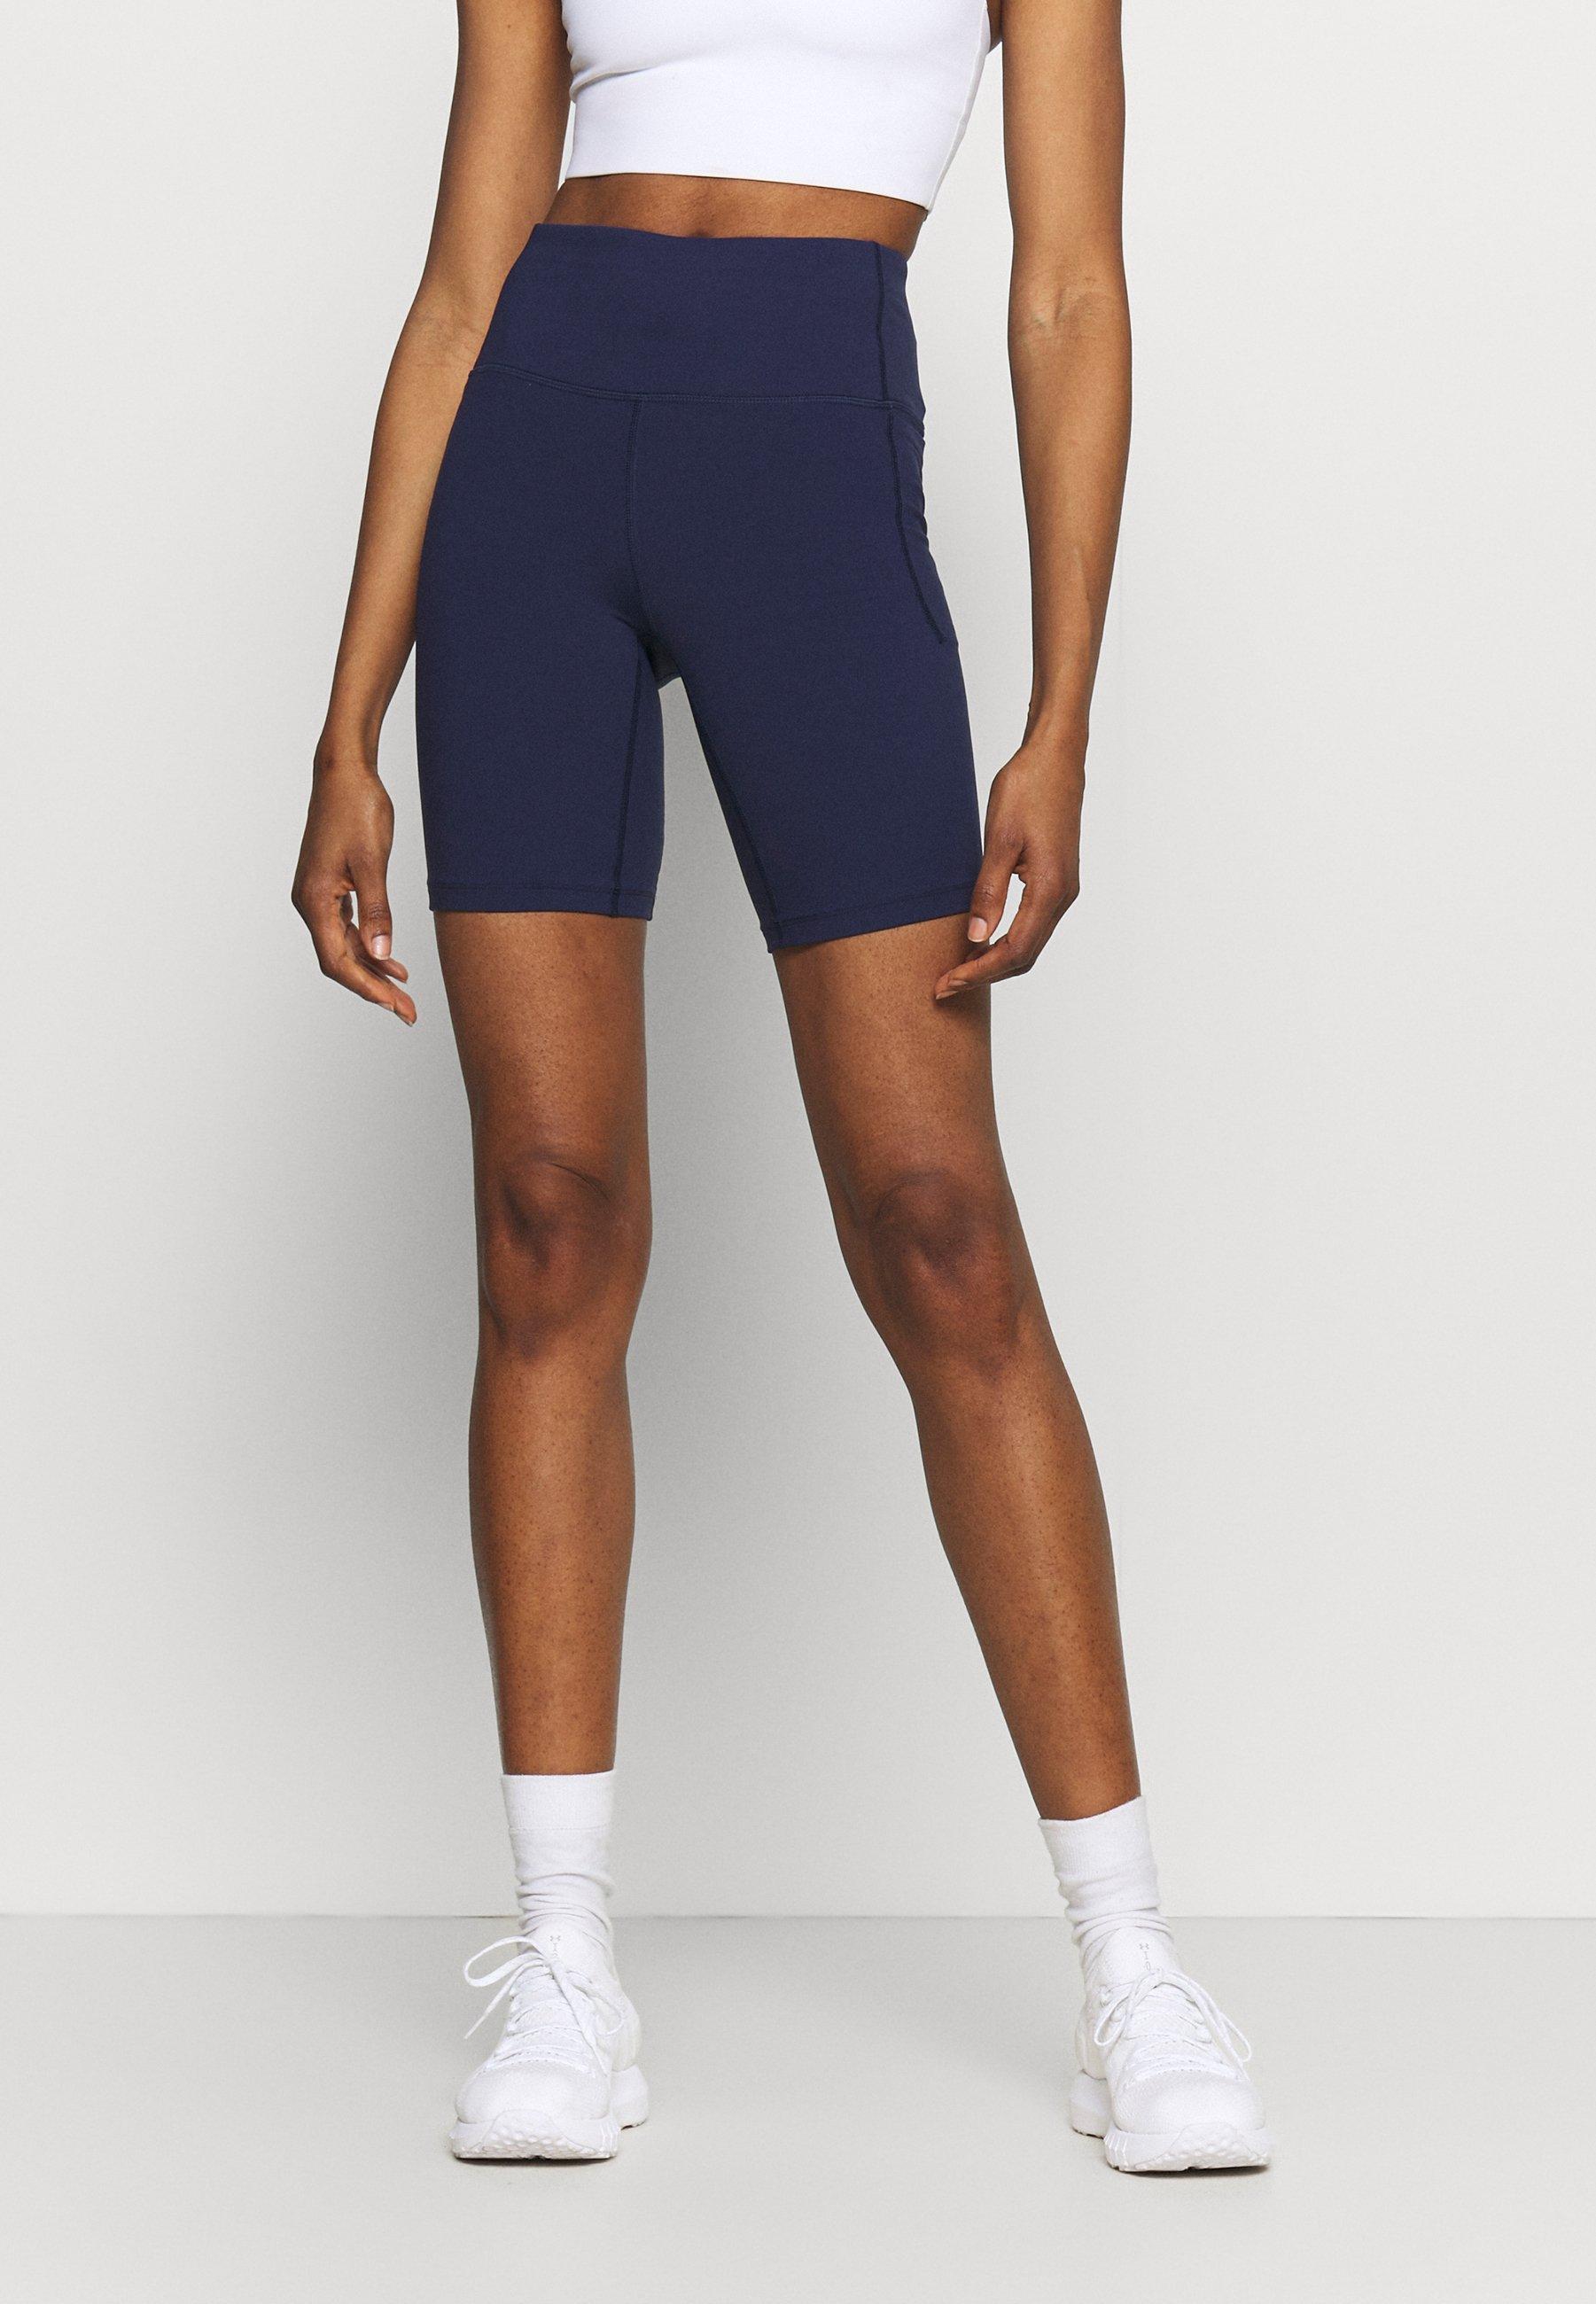 Femme MERIDIAN BIKE SHORTS - Collants